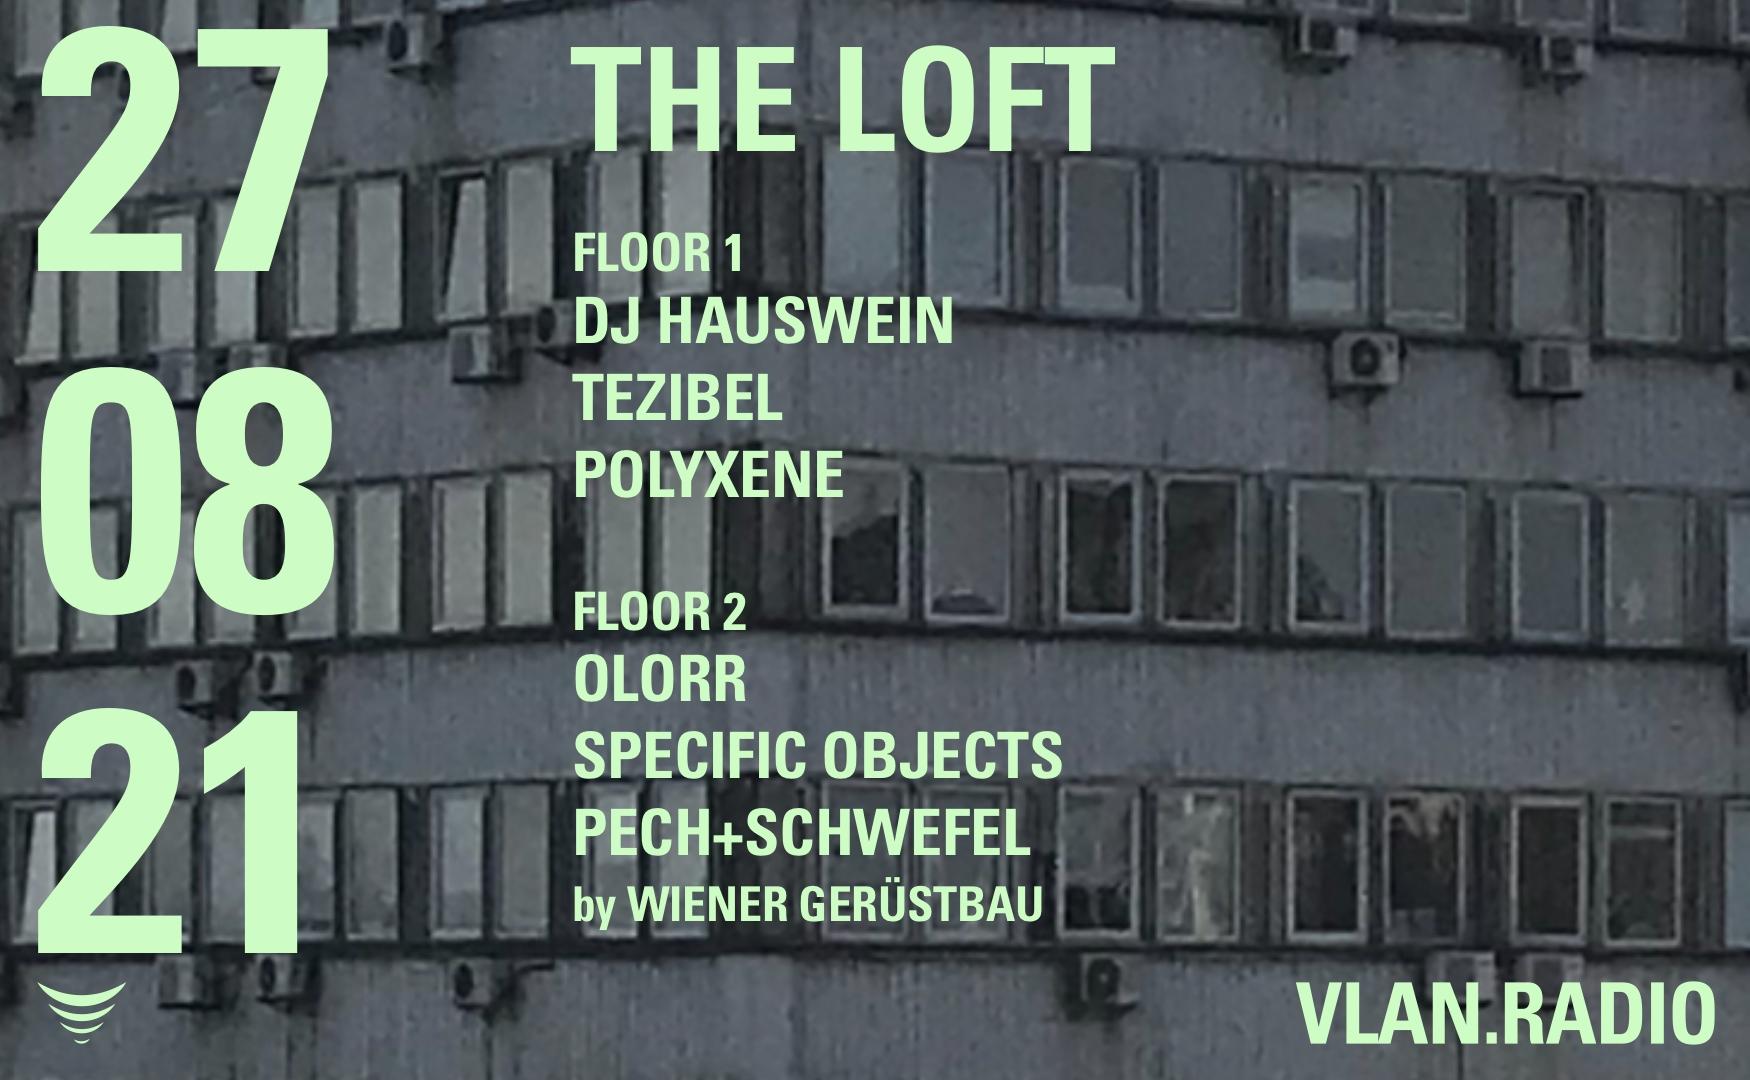 VLAN.live x Wiener Gerüstbau am 27. August 2021 @ The Loft.